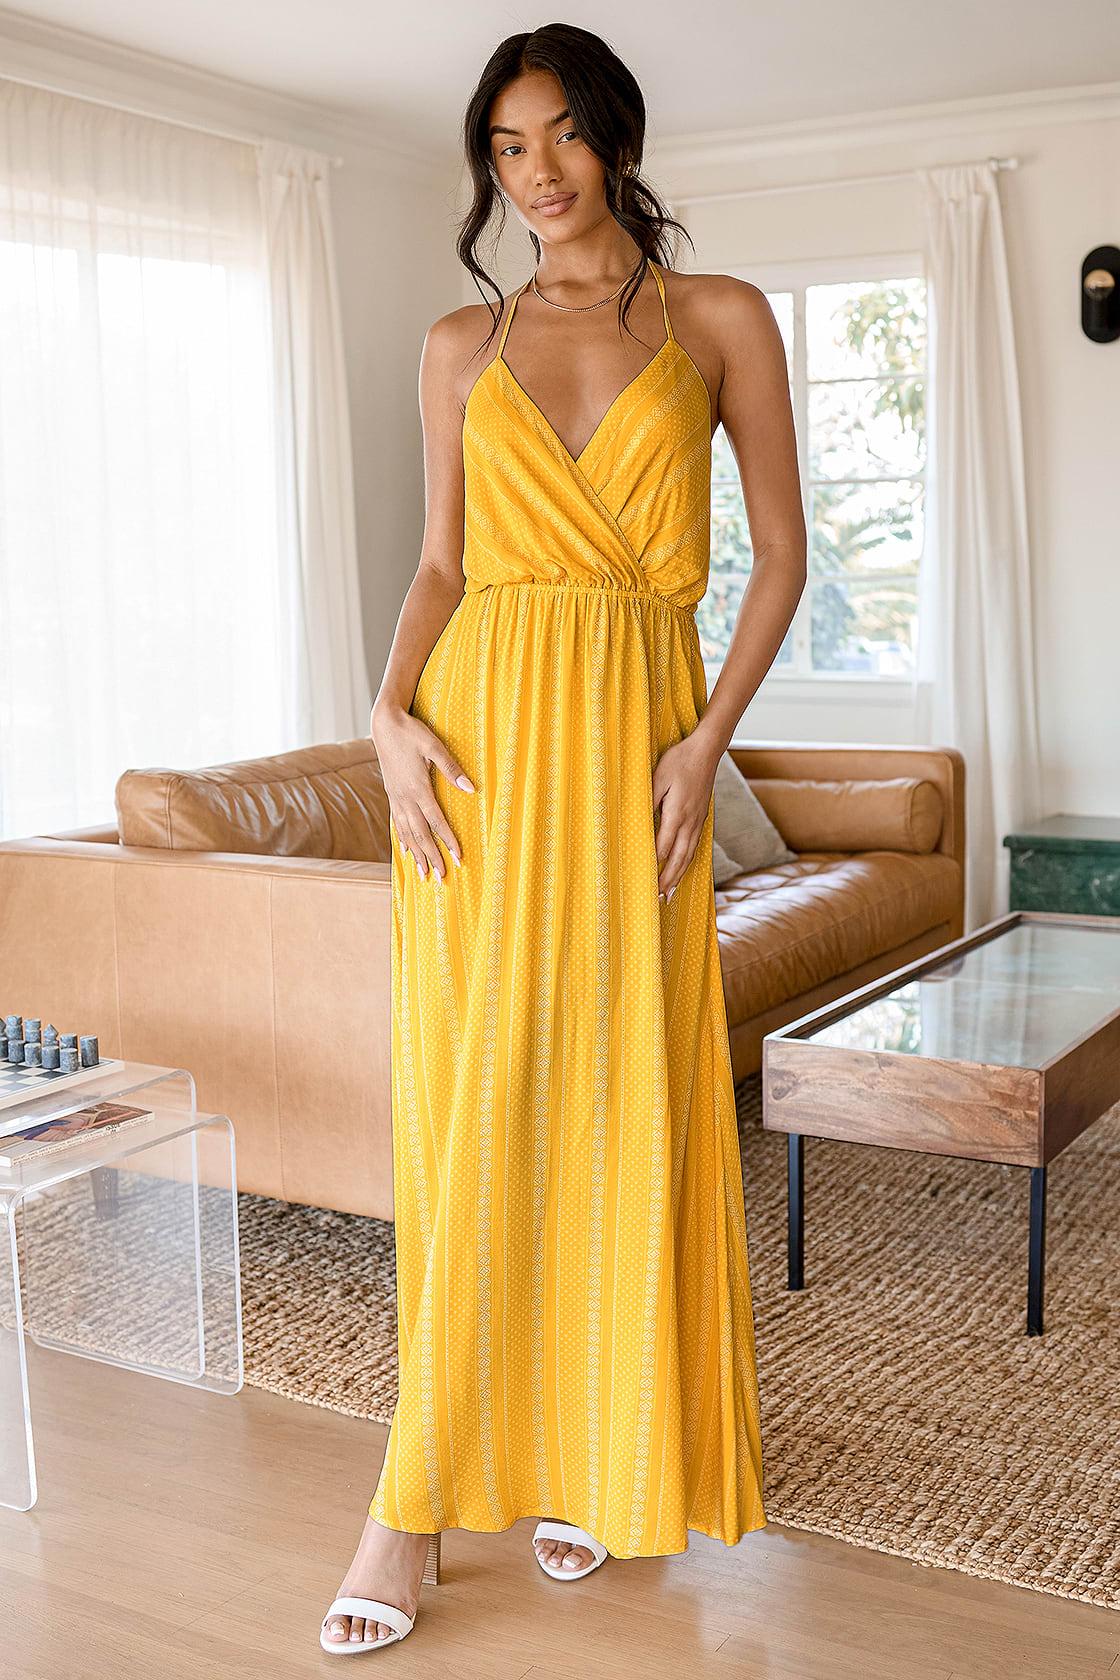 Bayside Breeze Yellow Multi Print Halter Maxi Dress